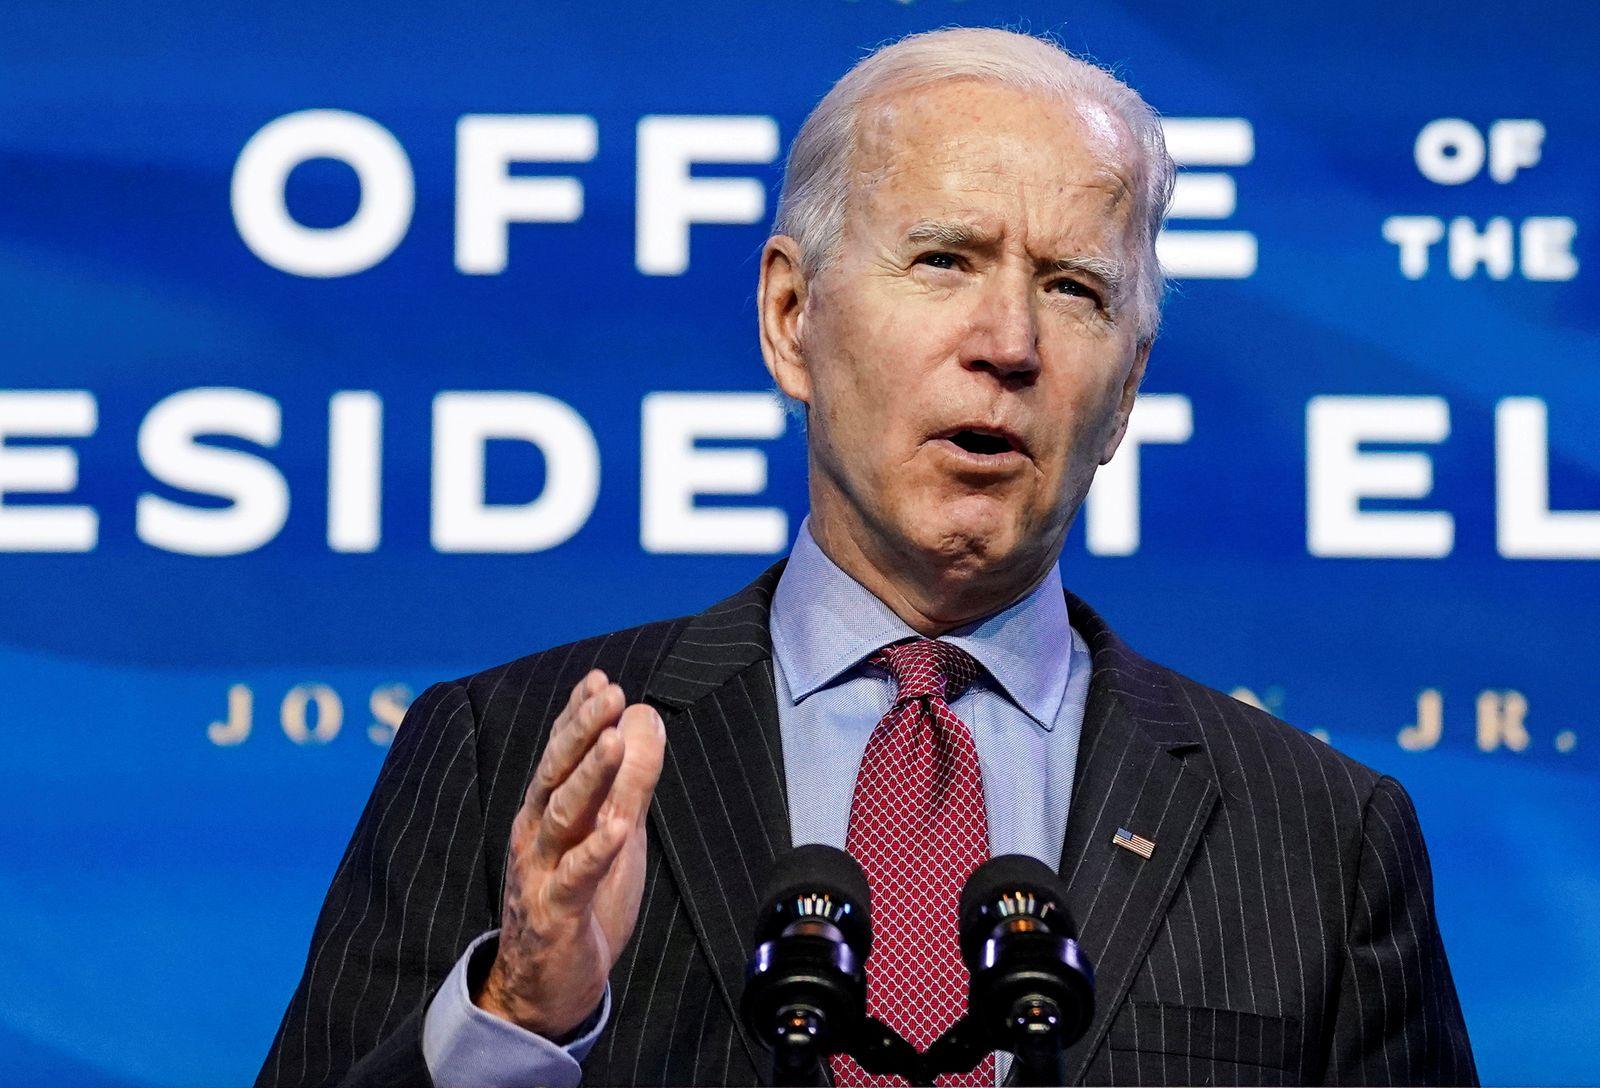 FILE PHOTO: U.S. President-elect Joe Biden announces economics and jobs team nominees at transition headquarters in Wilmington, Delaware